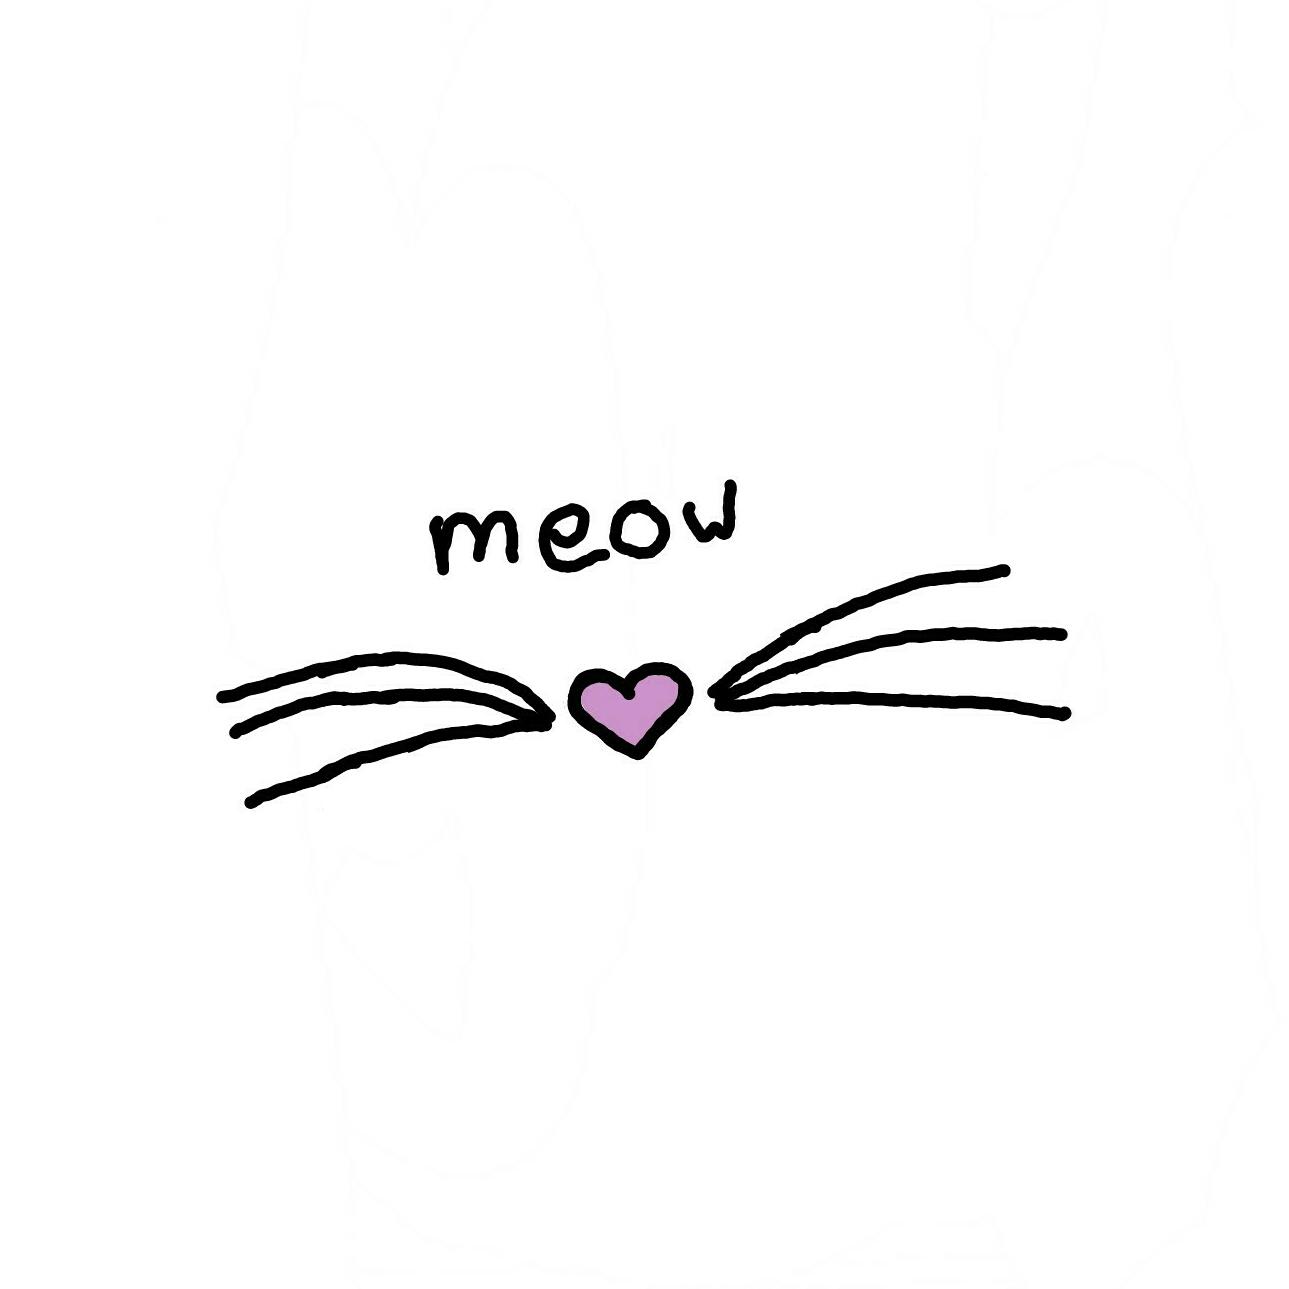 Cat Wallpaper Iphone Tumblr Overlay Overlay Transparent Png Tumblr Cats Meow